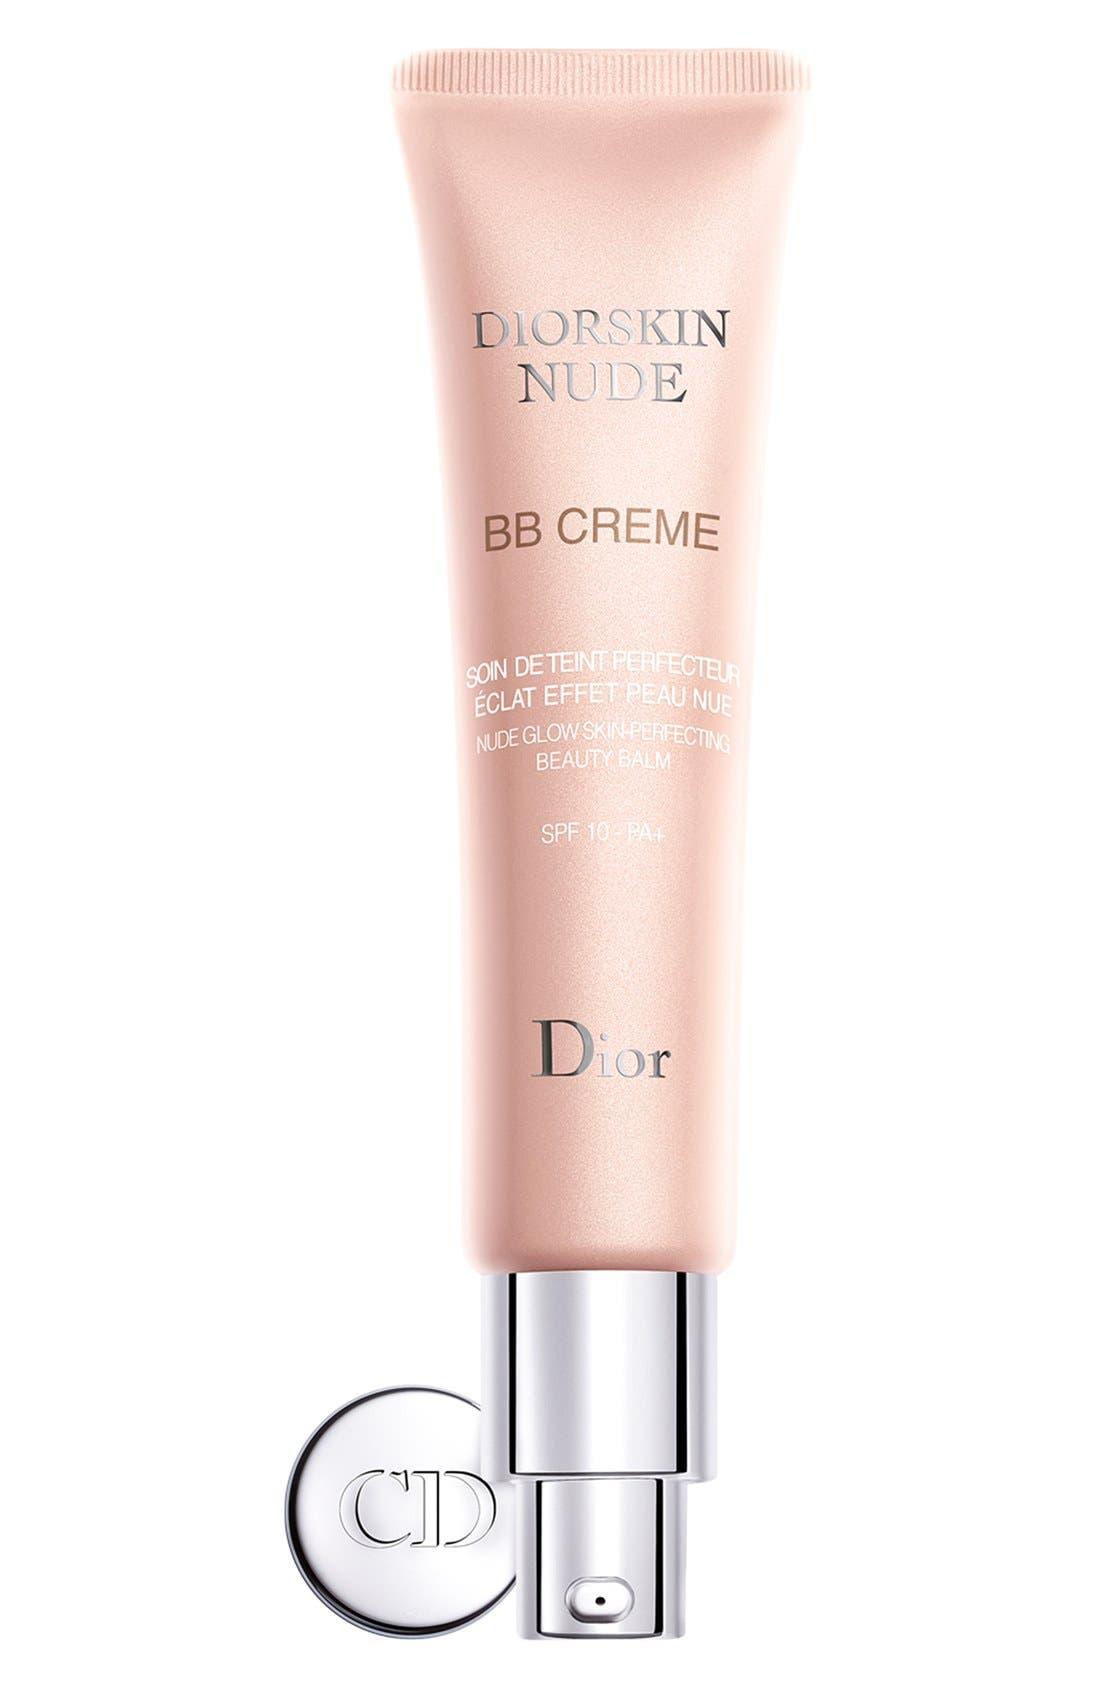 'Diorskin Nude' BB Creme Broad Spectrum SPF 10,                         Main,                         color, 250